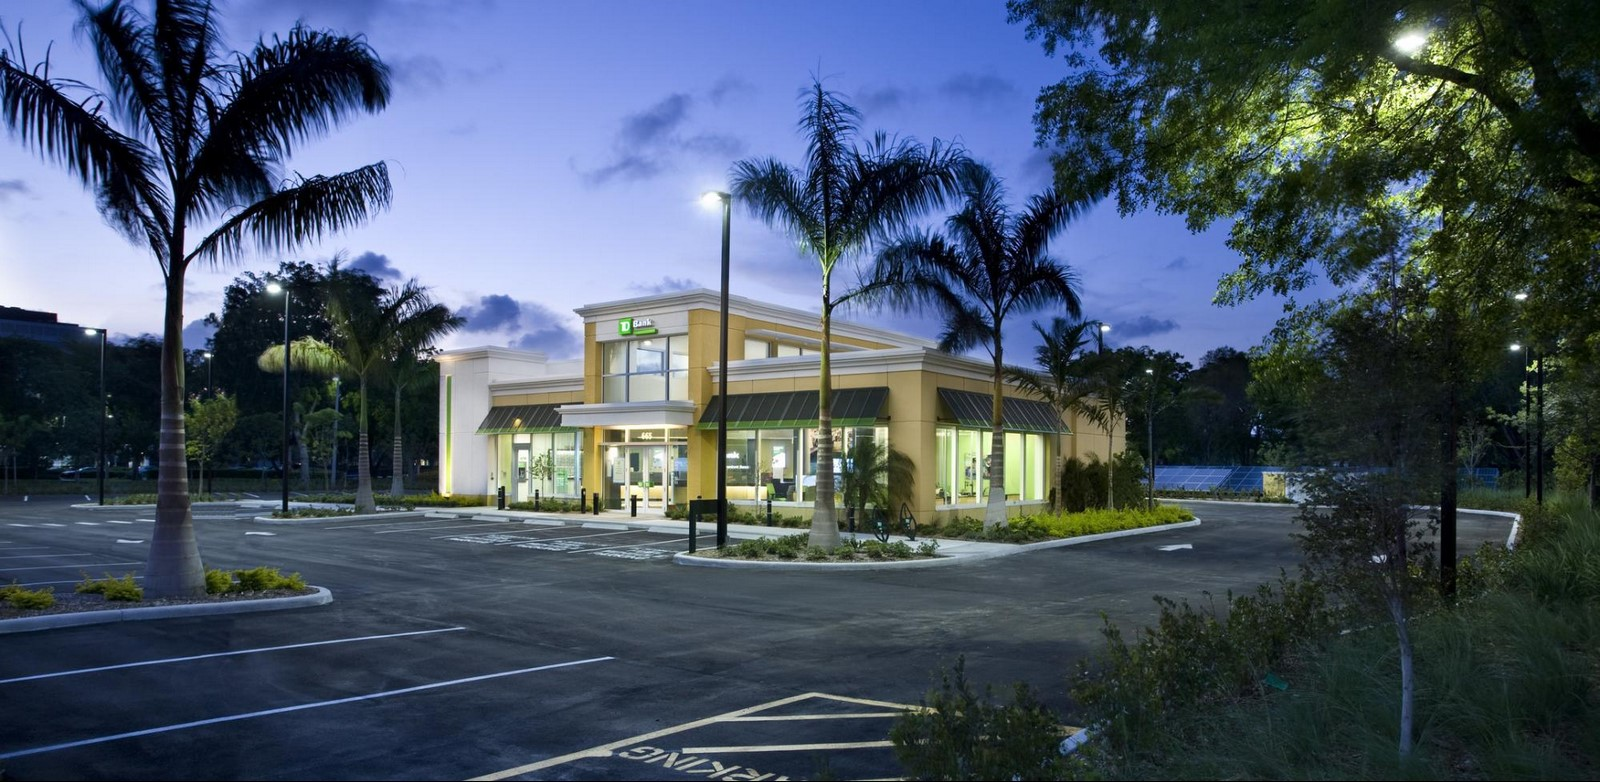 TD Banks' first net-zero energy Branch in the U.S- sheet2